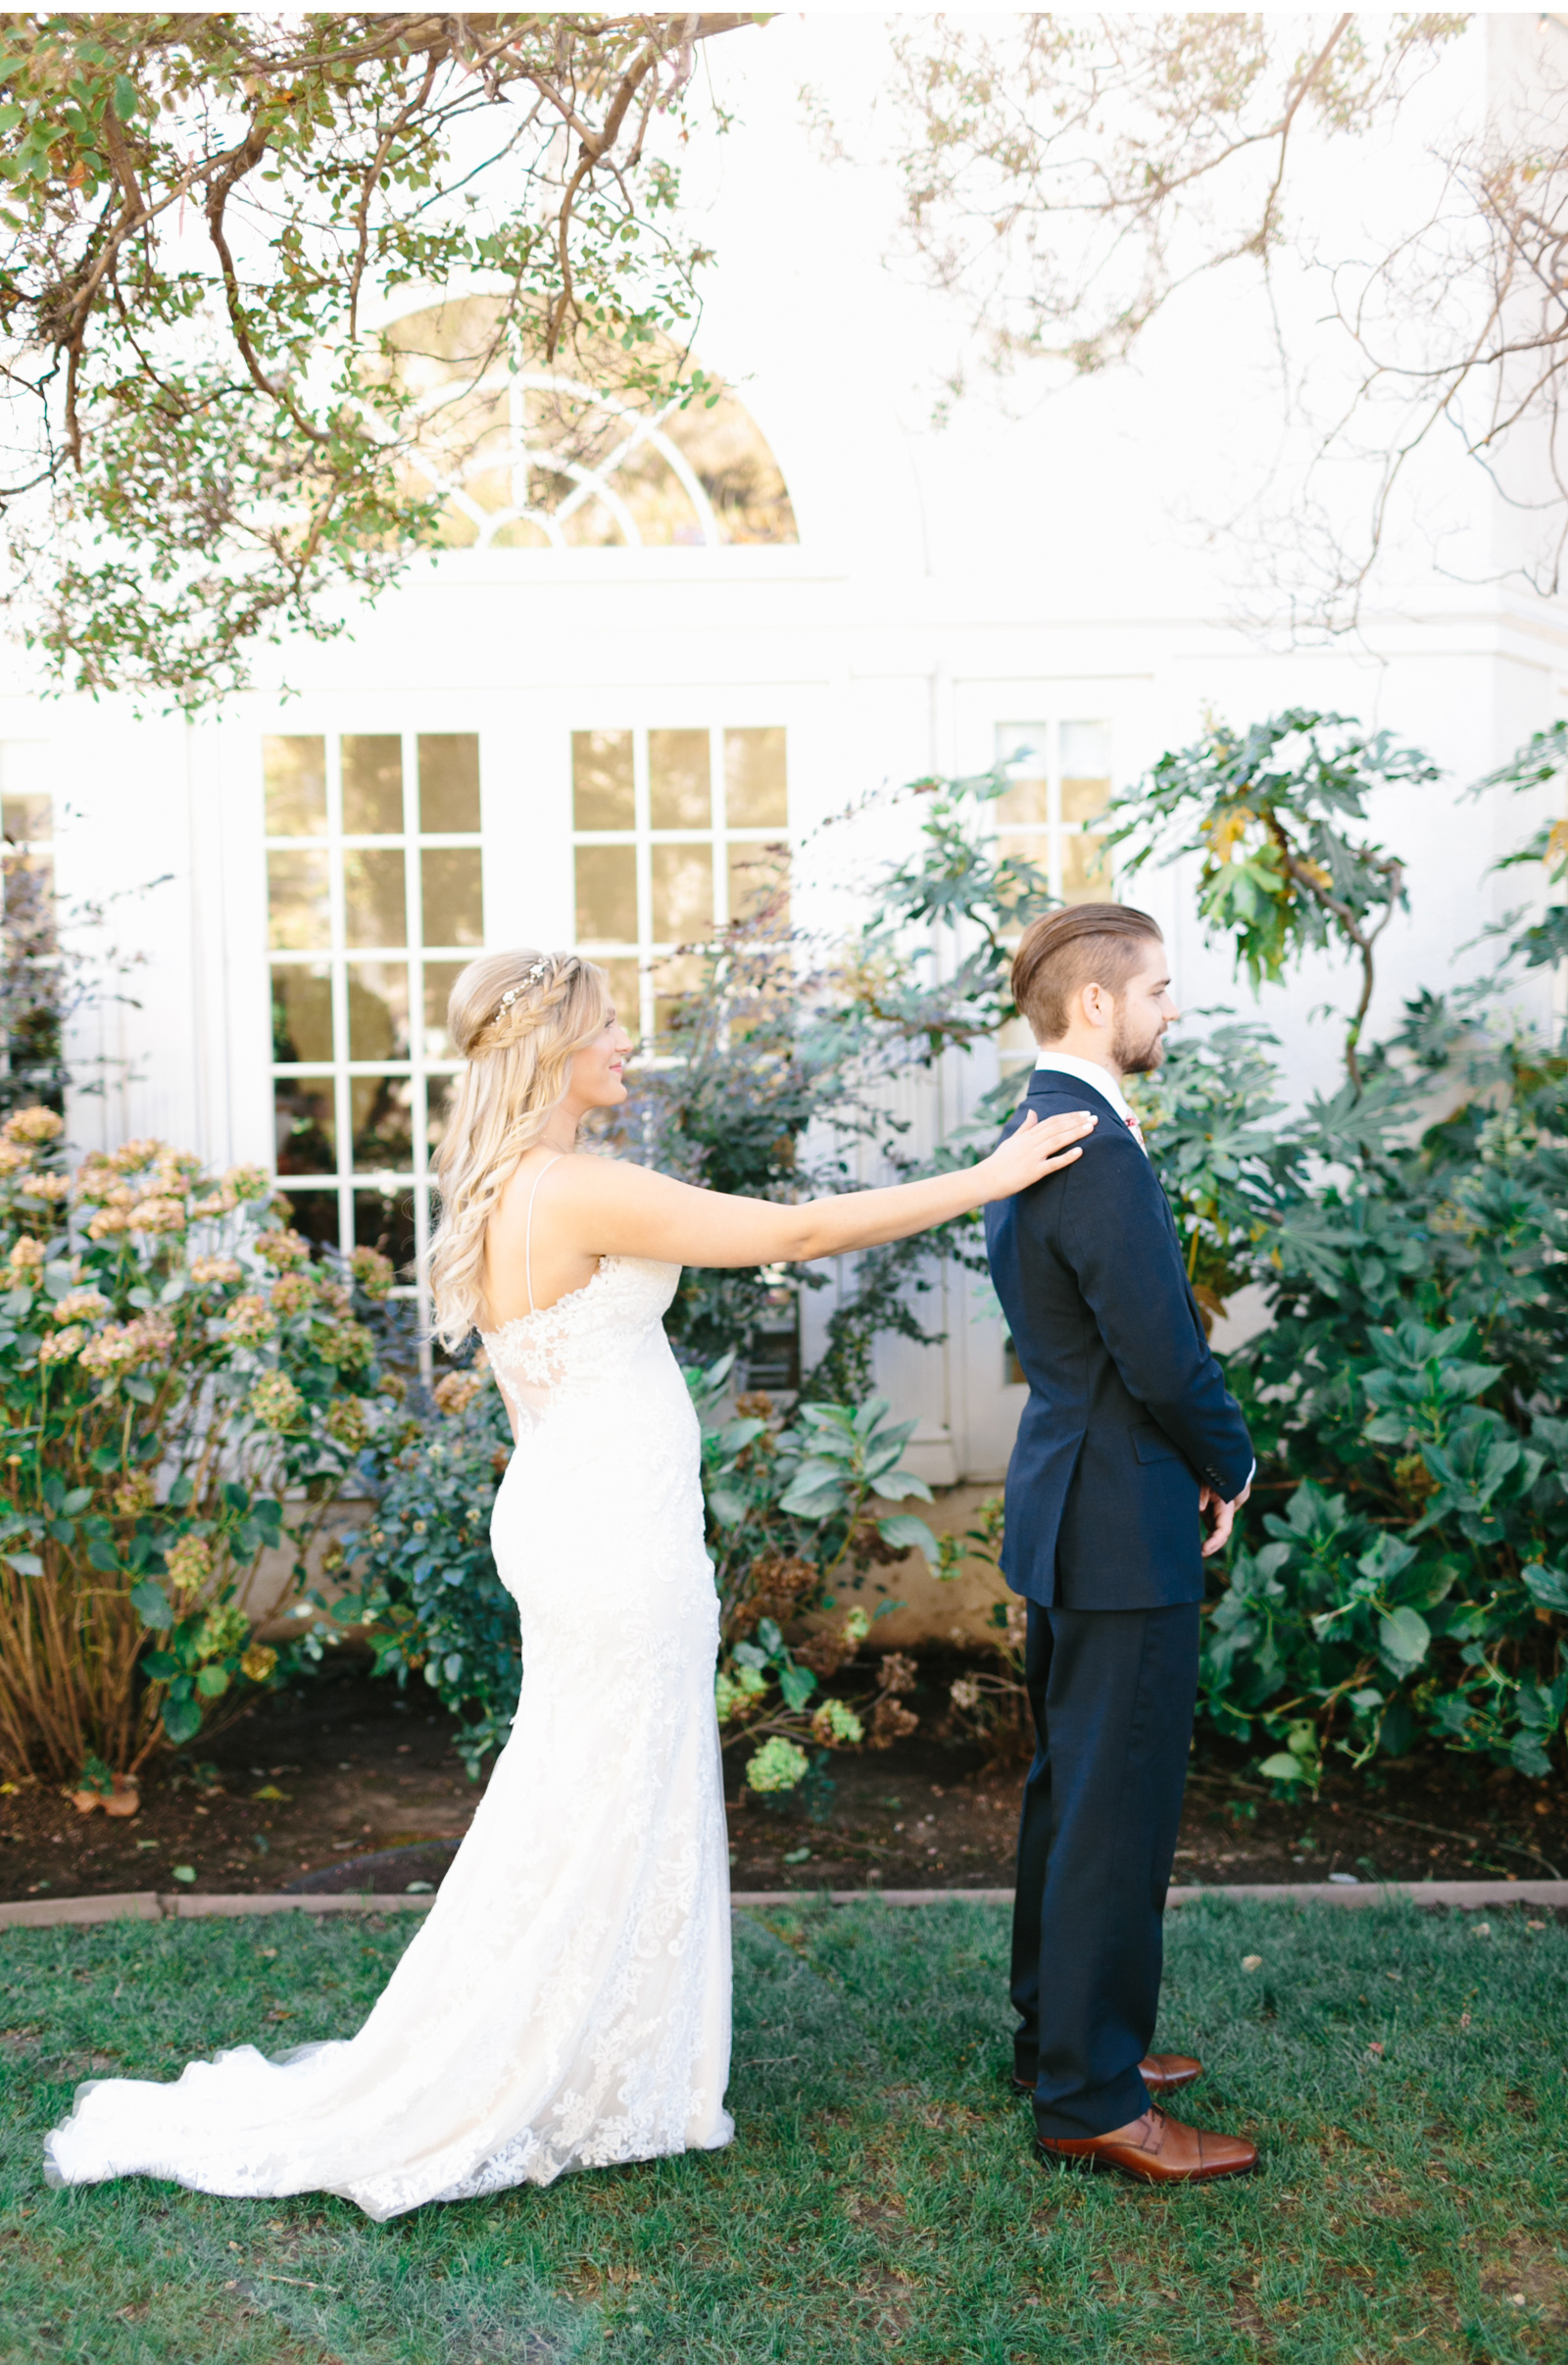 Malibu-Wedding-Photographer-Natalie-Schutt-Photography-Vizcaya_10.jpg